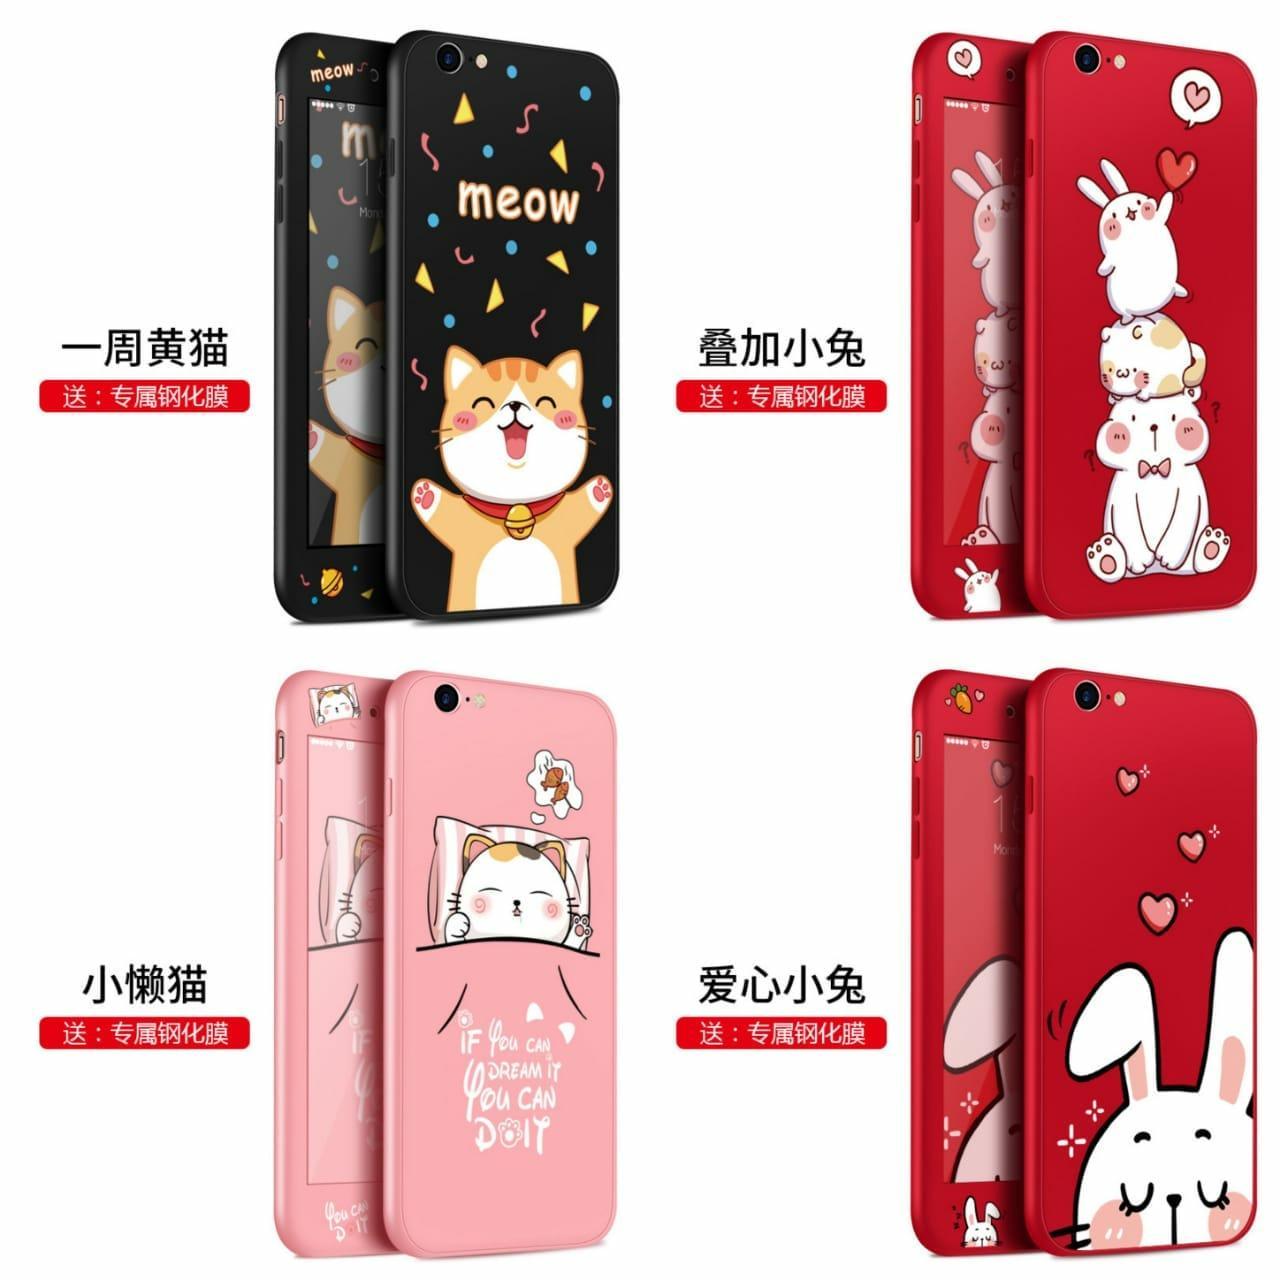 Case A71 / Case 360 A71 / Hardcase Oppo A71 / Case/Hardcase 360 Radish Bunny Plus Glass For Oppo A71_2509